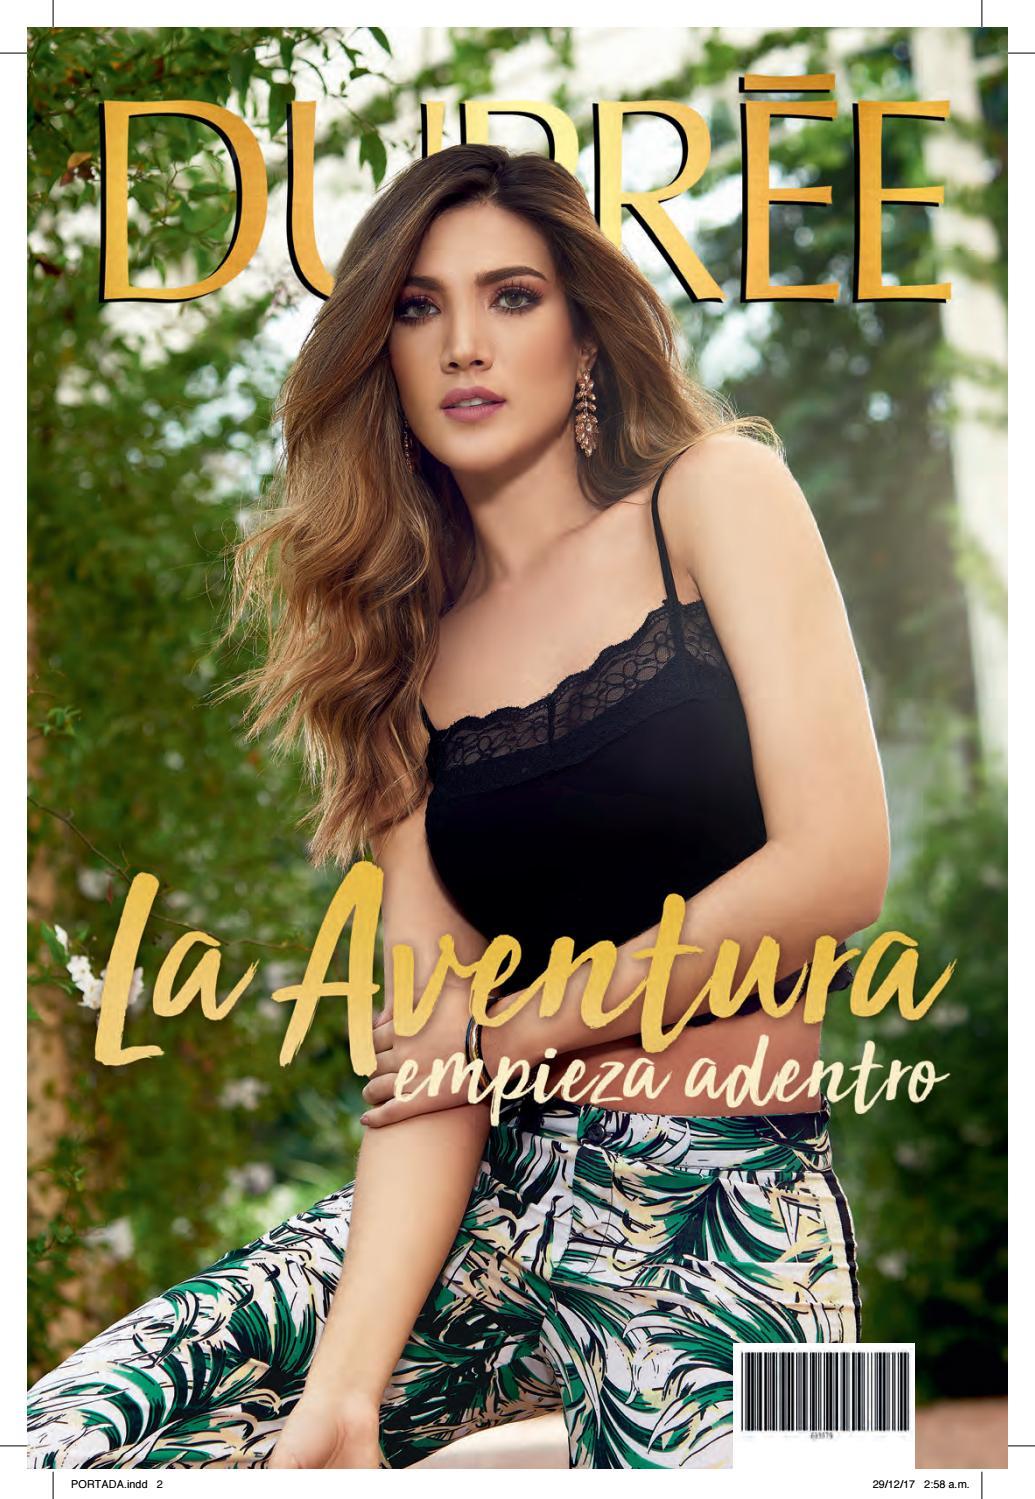 Catálogo 04 - Duprée by Duprée Perú - issuu 39643c952690